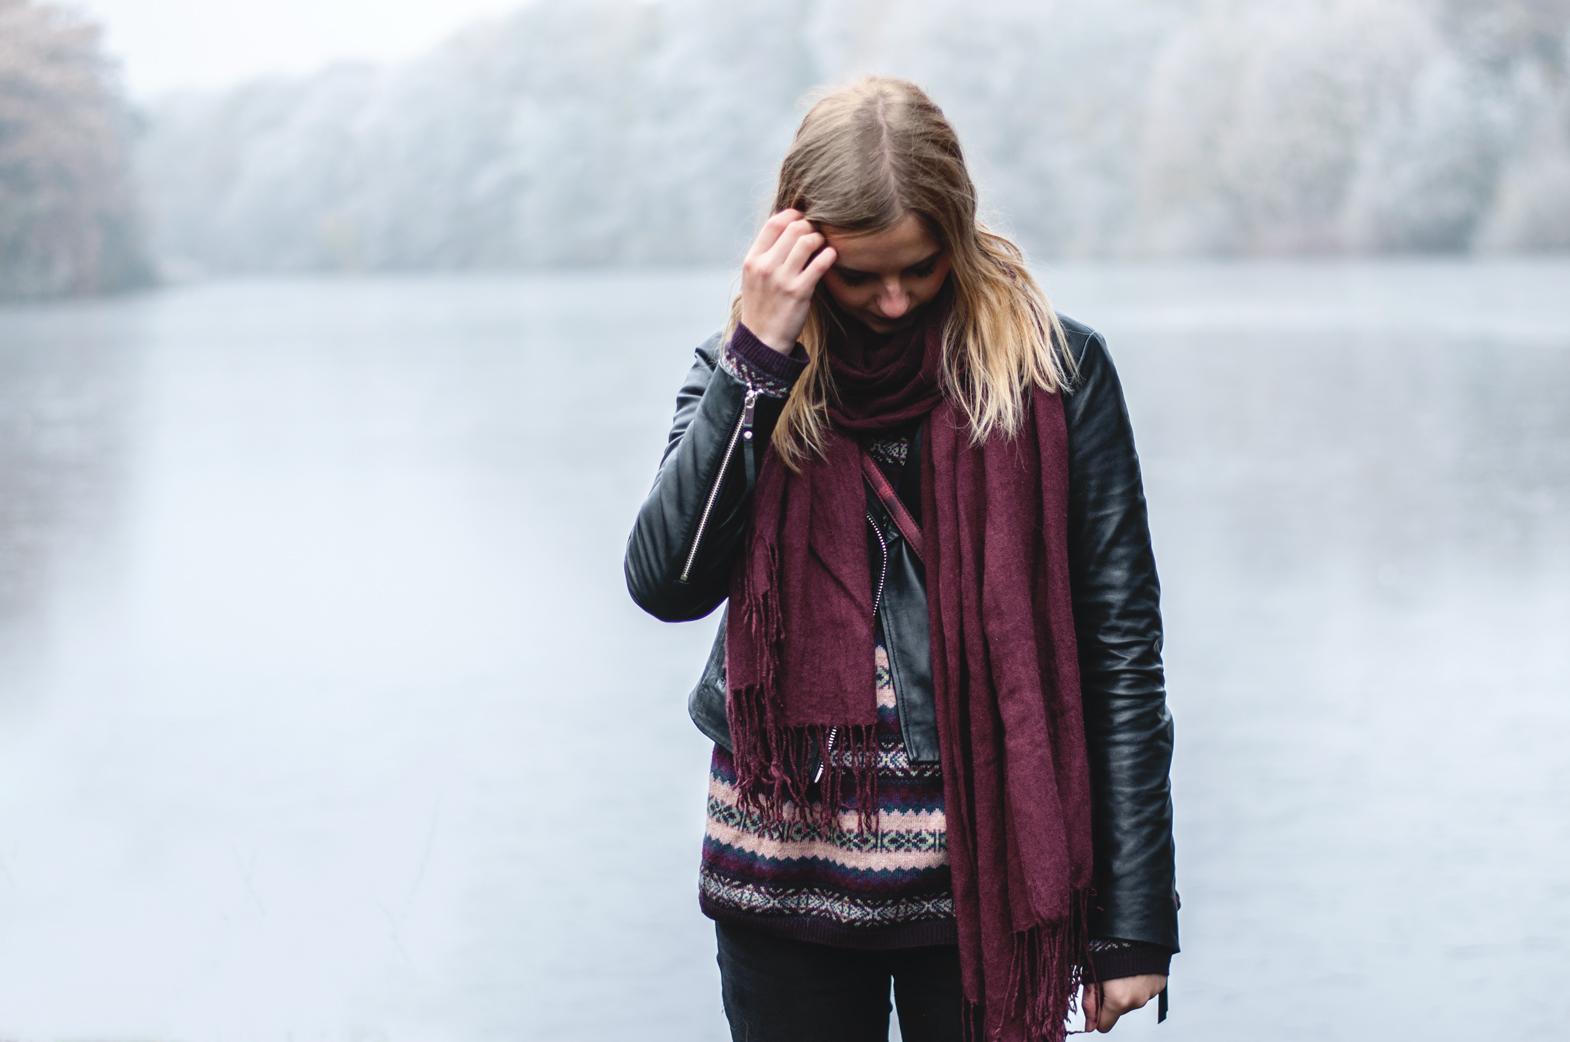 Hipster Frau im Winter